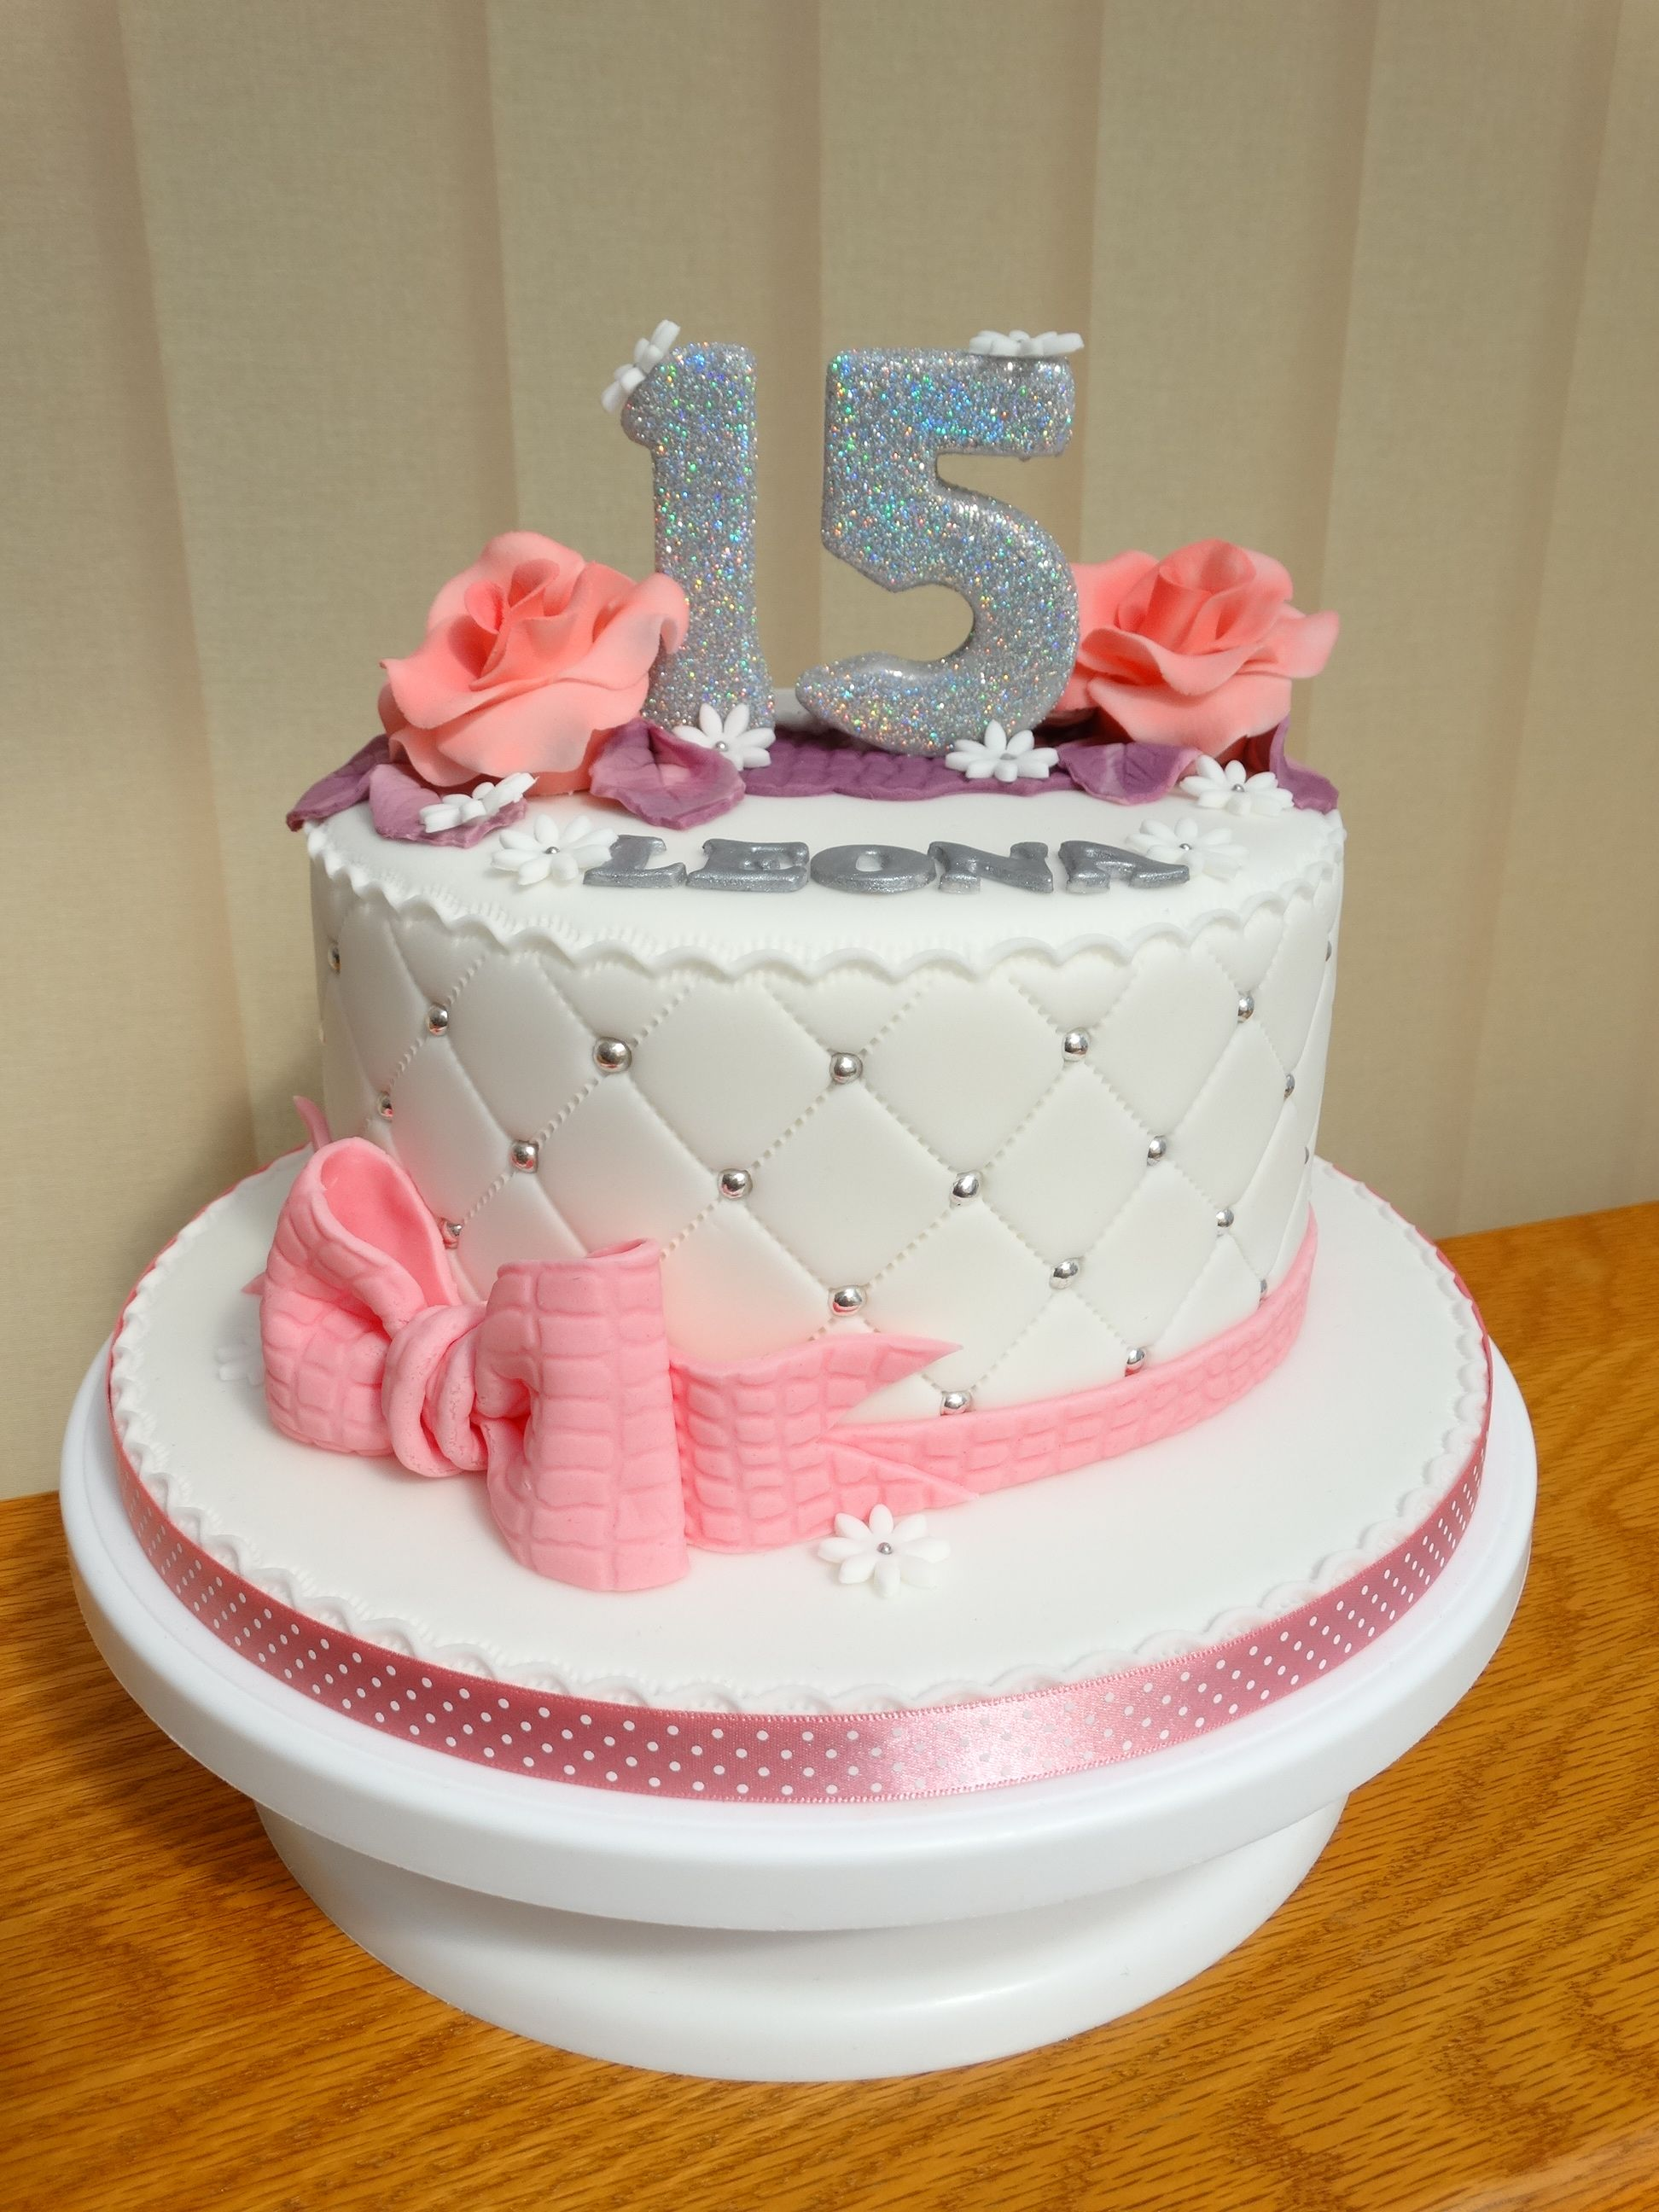 Fine 15Th Birthday Pink White Cake Xmcx Birthday Cake Kids Cake Birthday Cards Printable Riciscafe Filternl